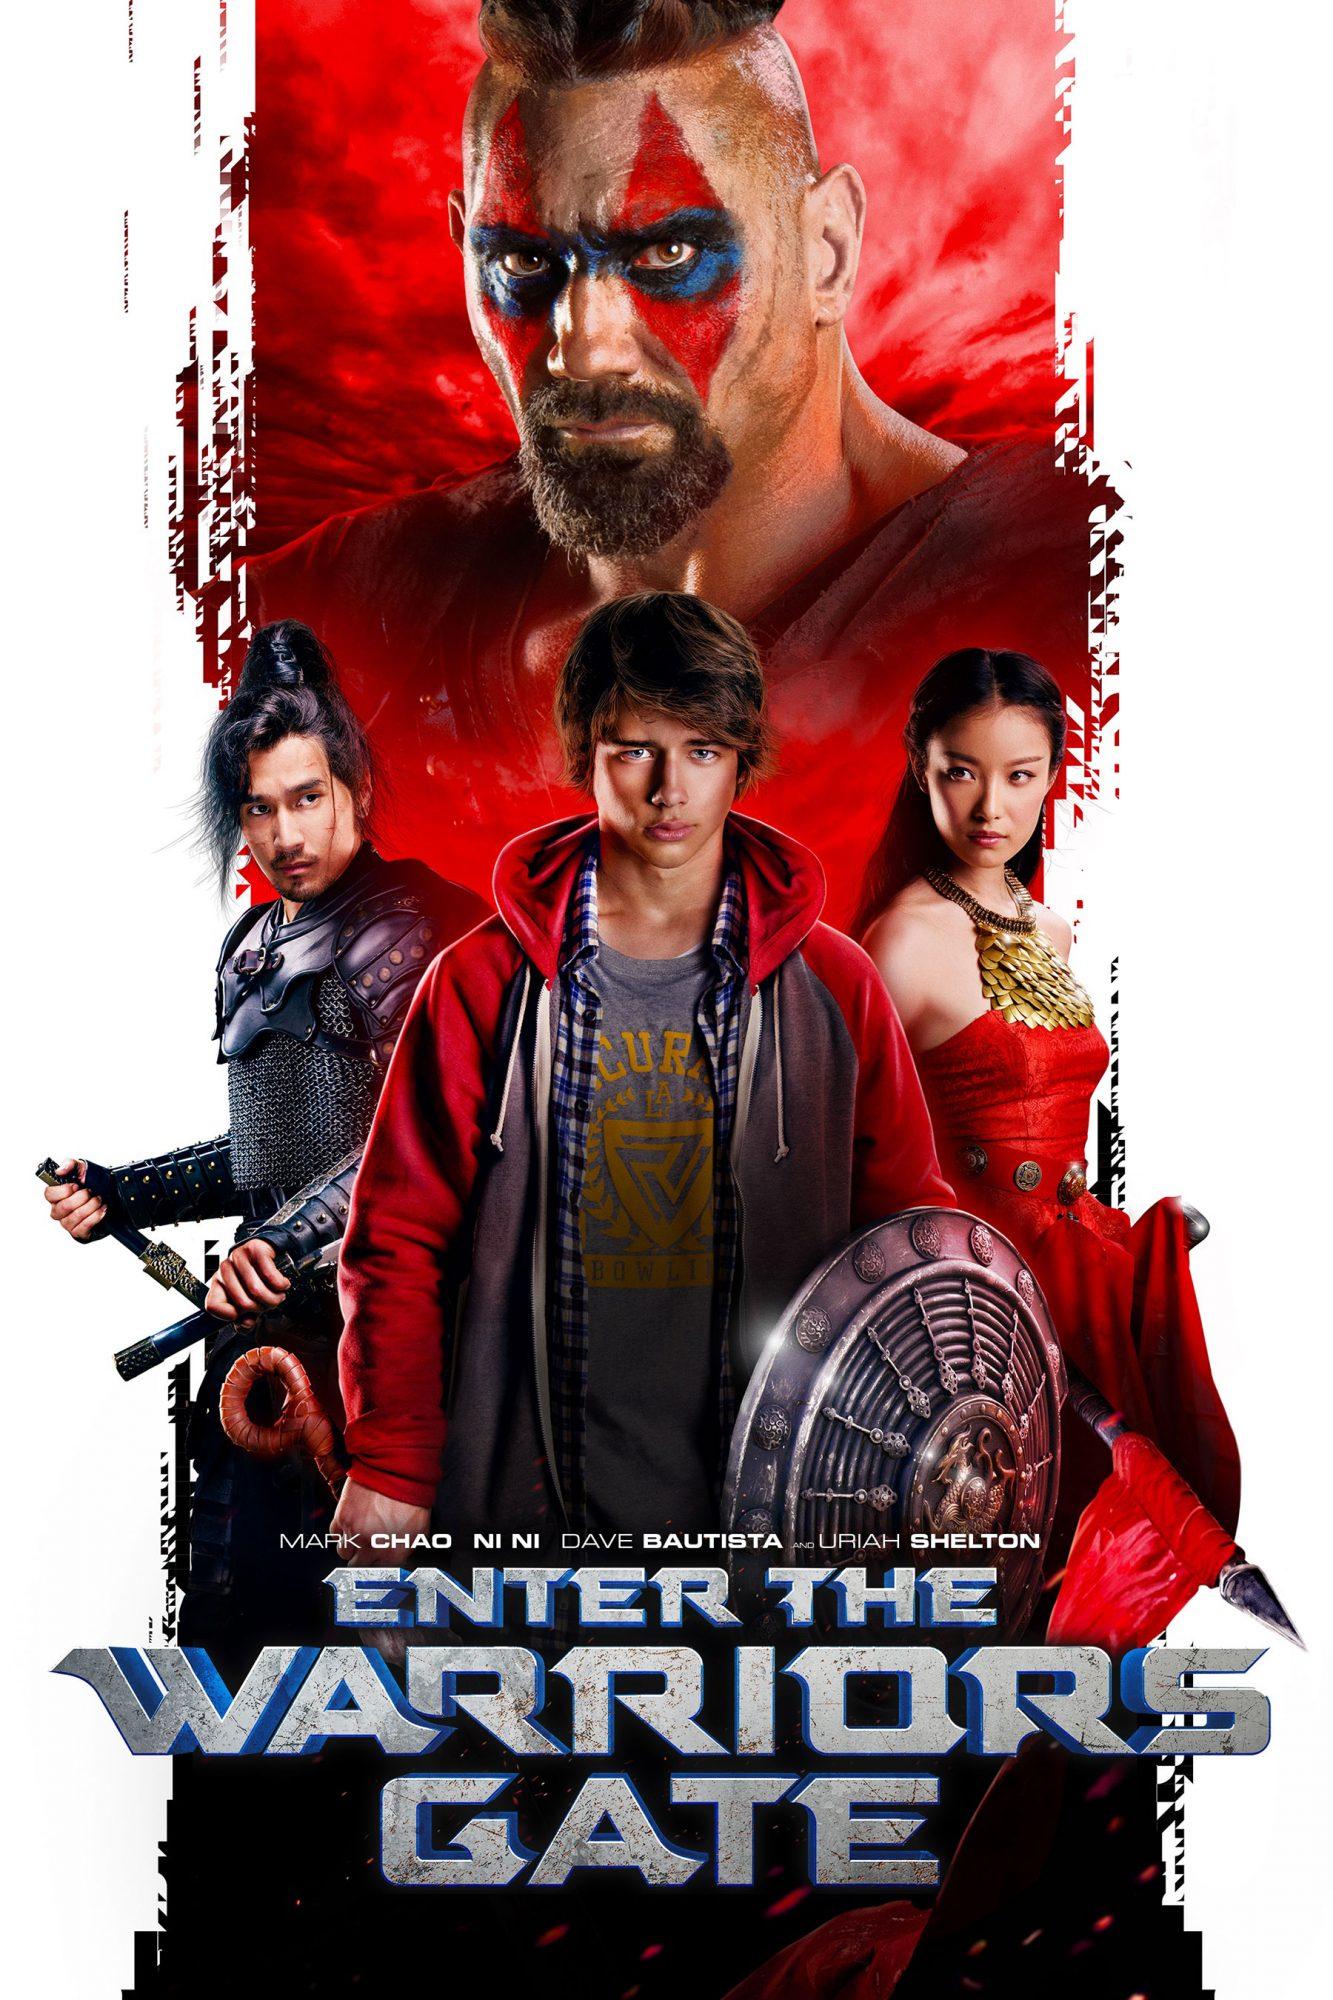 Enter the Warrior's Gate